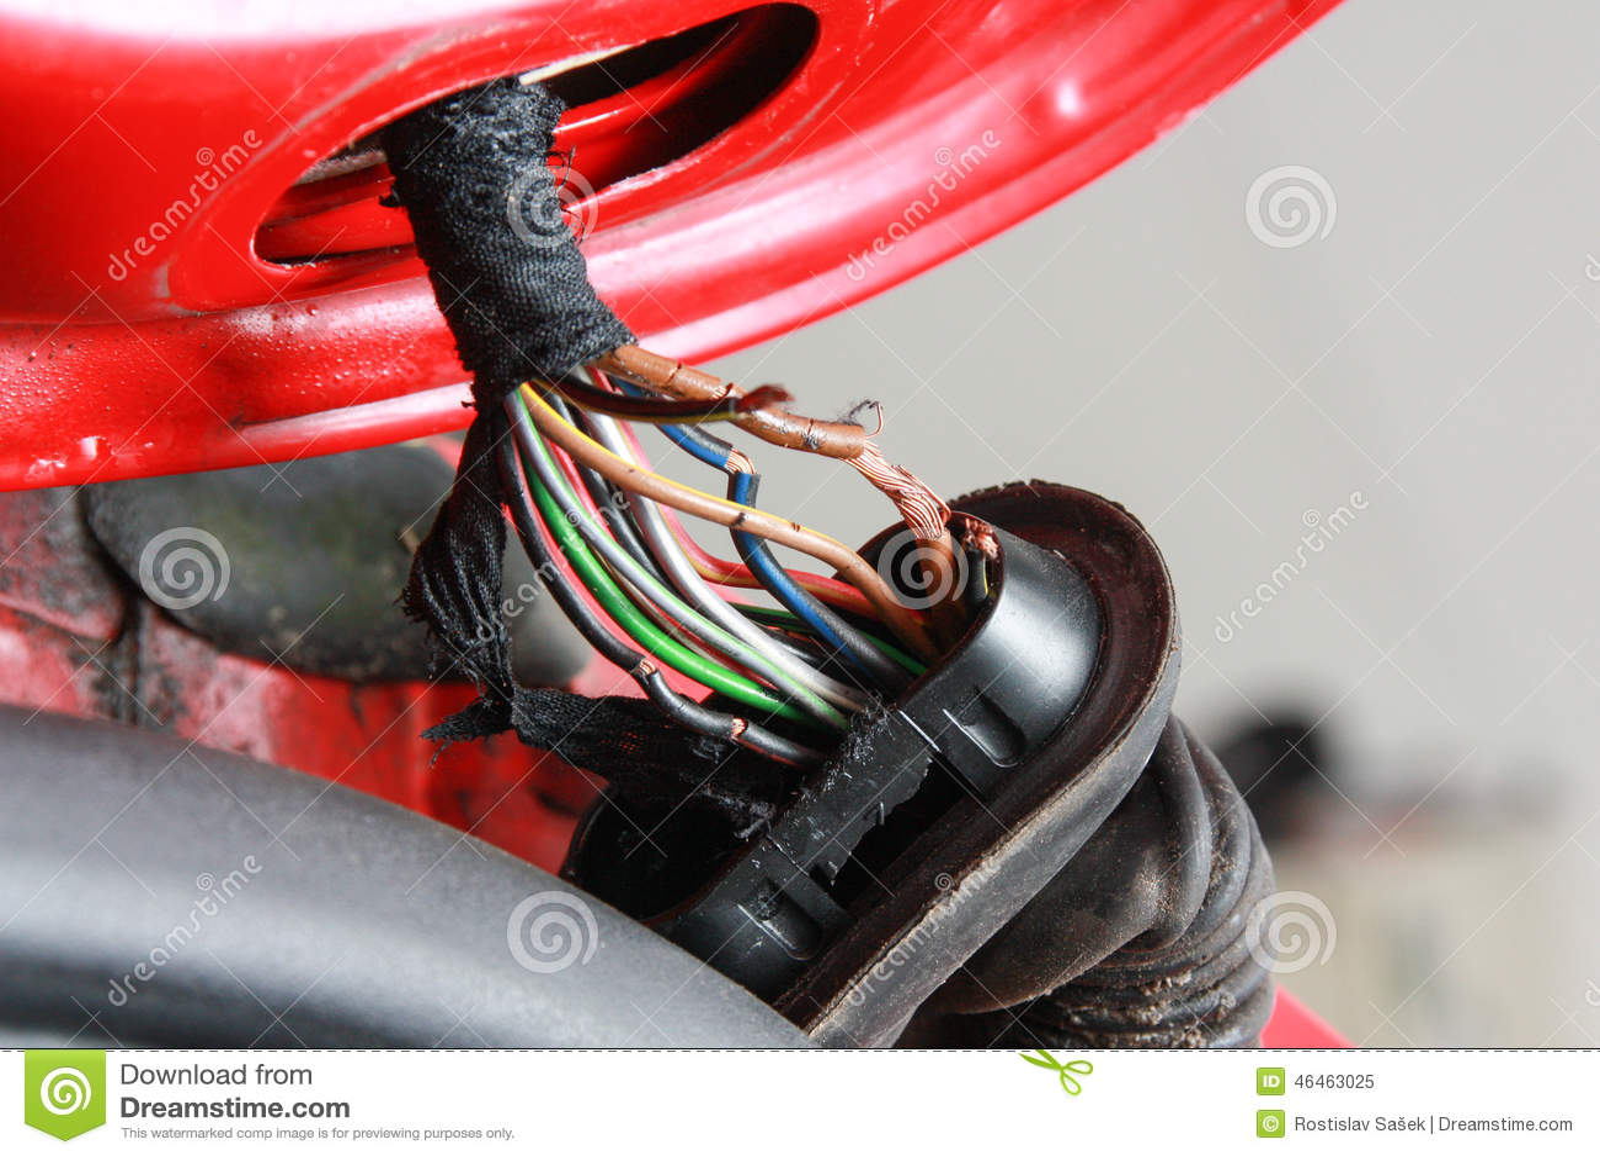 hight resolution of broken wires